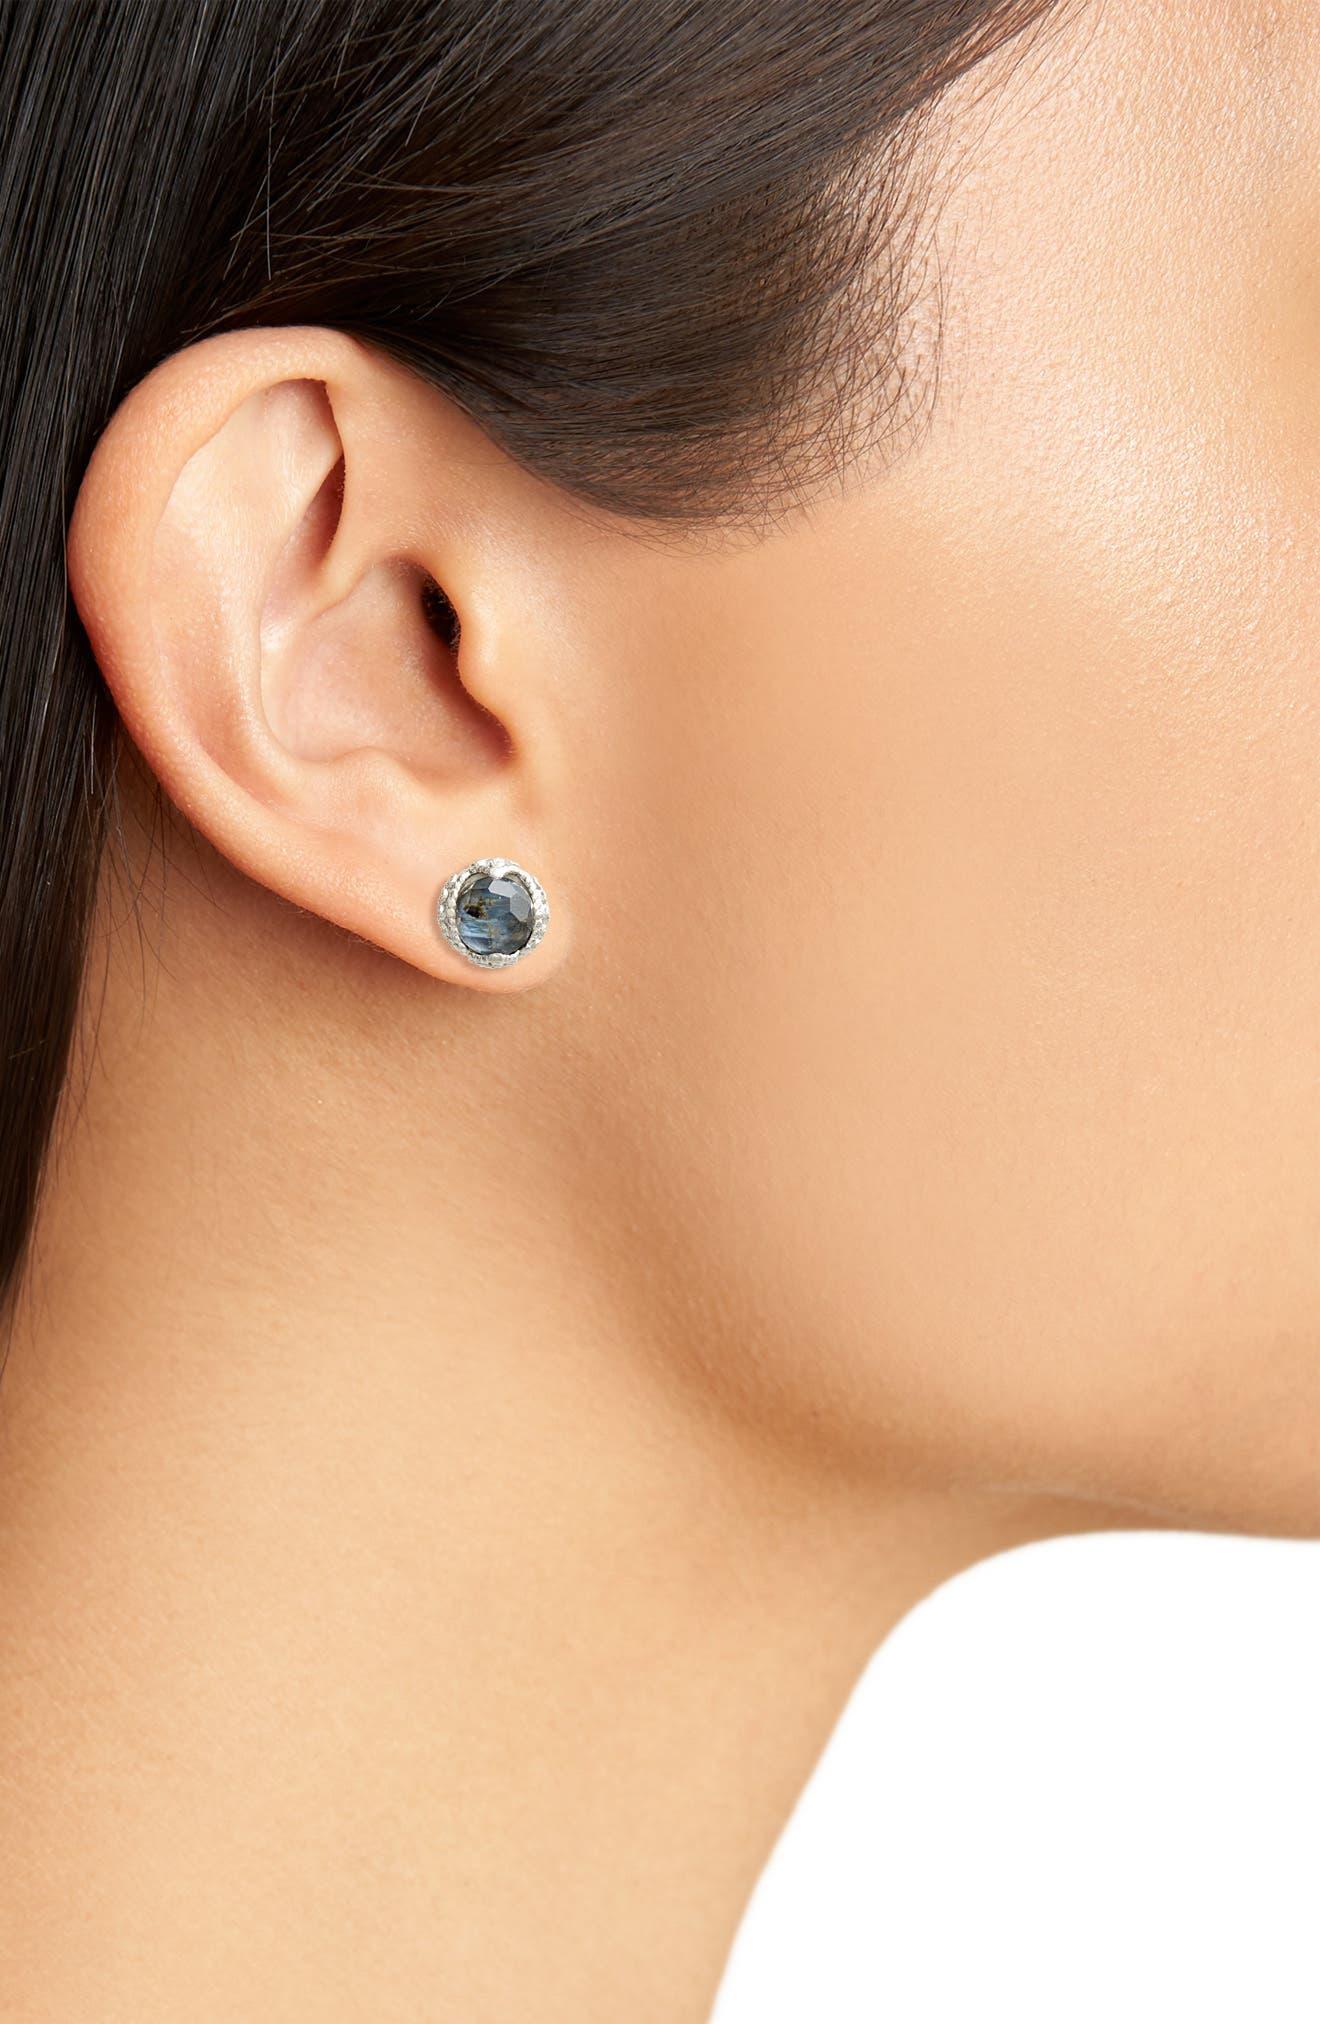 New World Stud Earrings,                             Alternate thumbnail 2, color,                             Silver